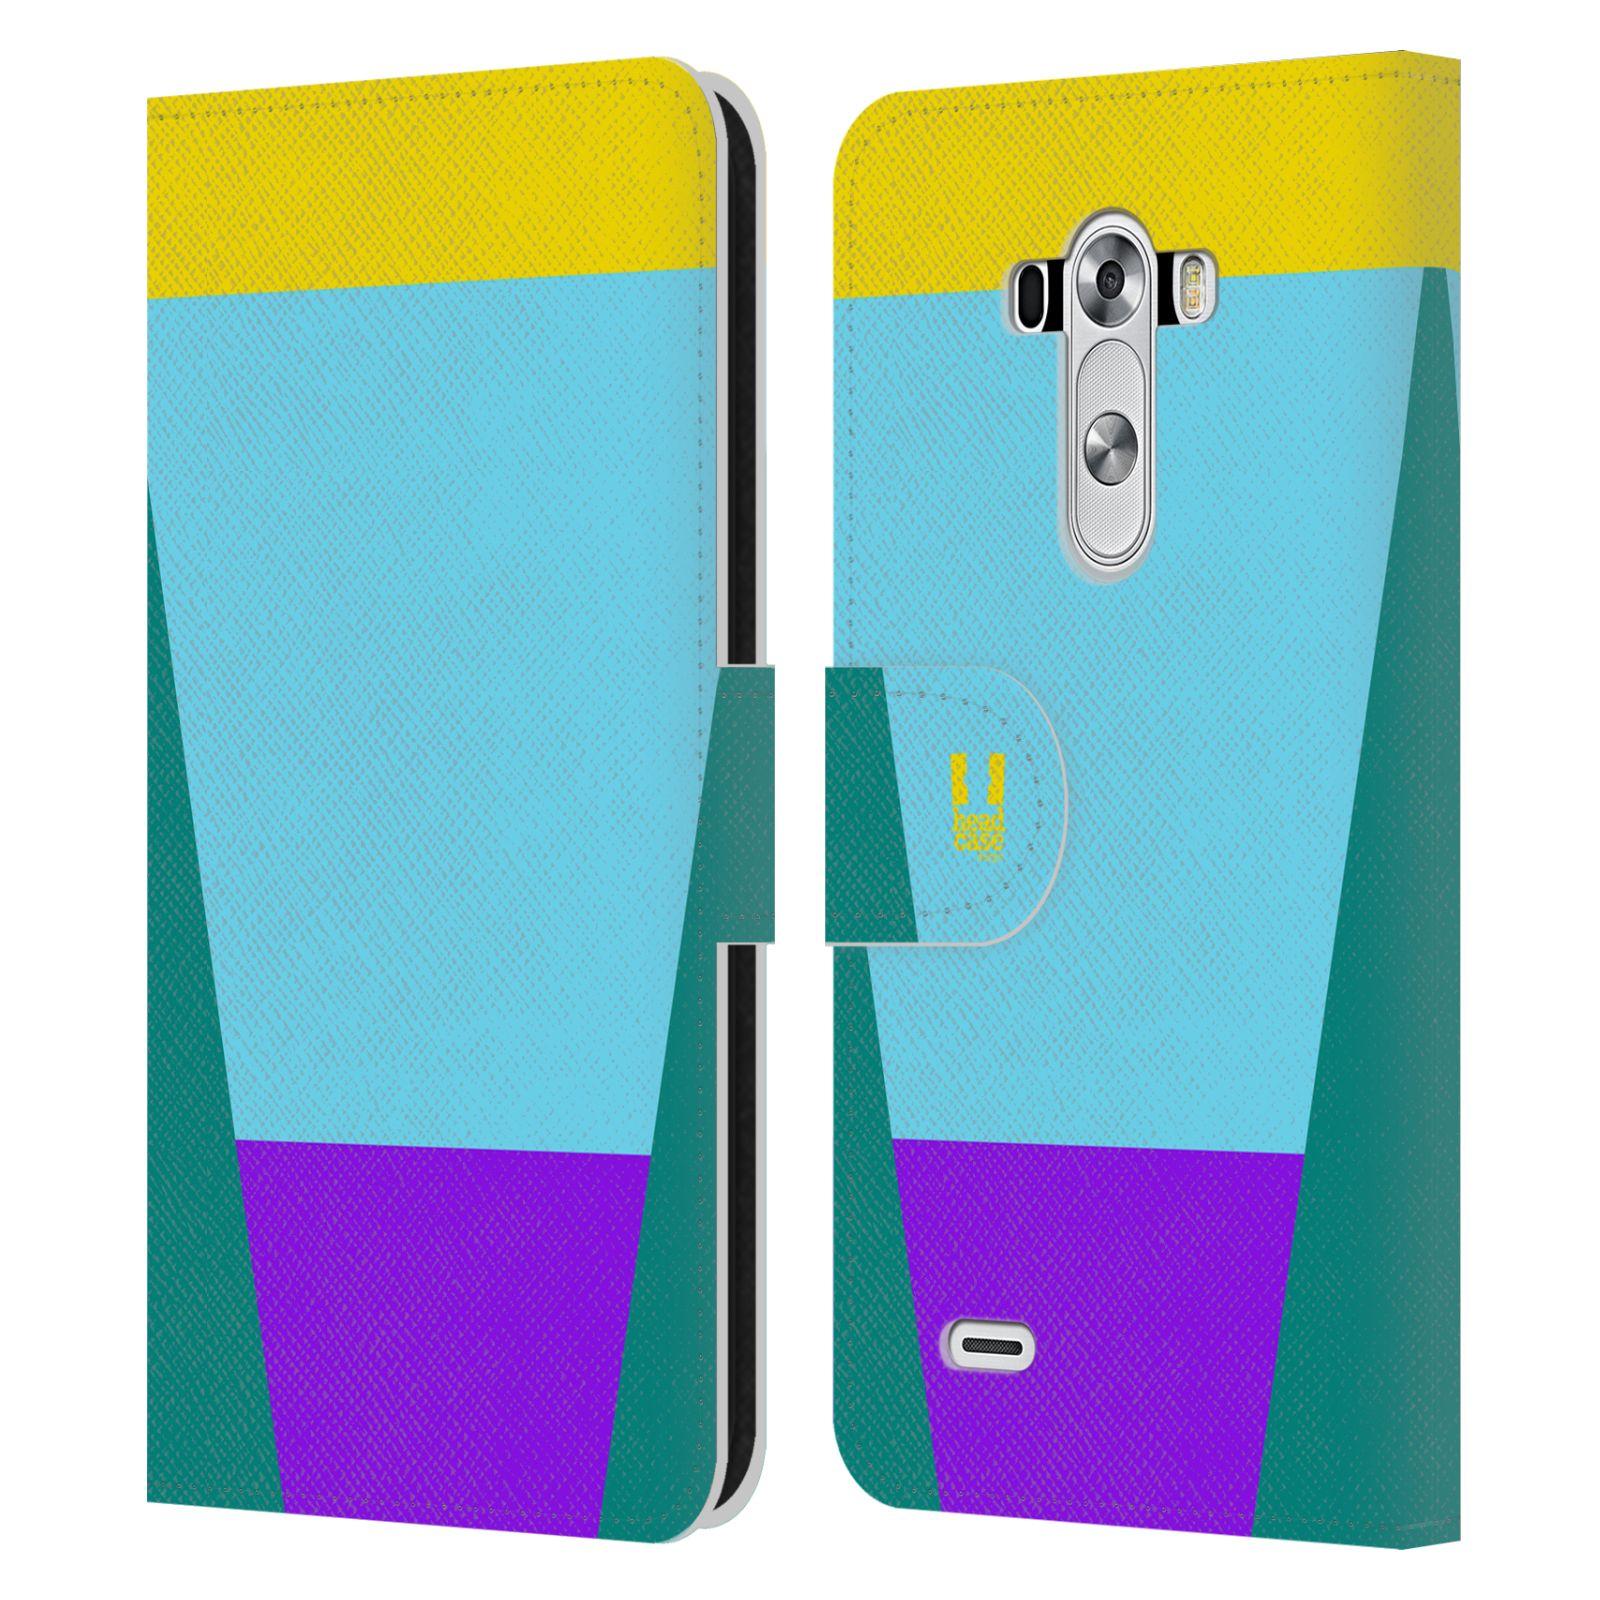 HEAD CASE Flipové pouzdro pro mobil LG G3 barevné tvary nebesky modrá